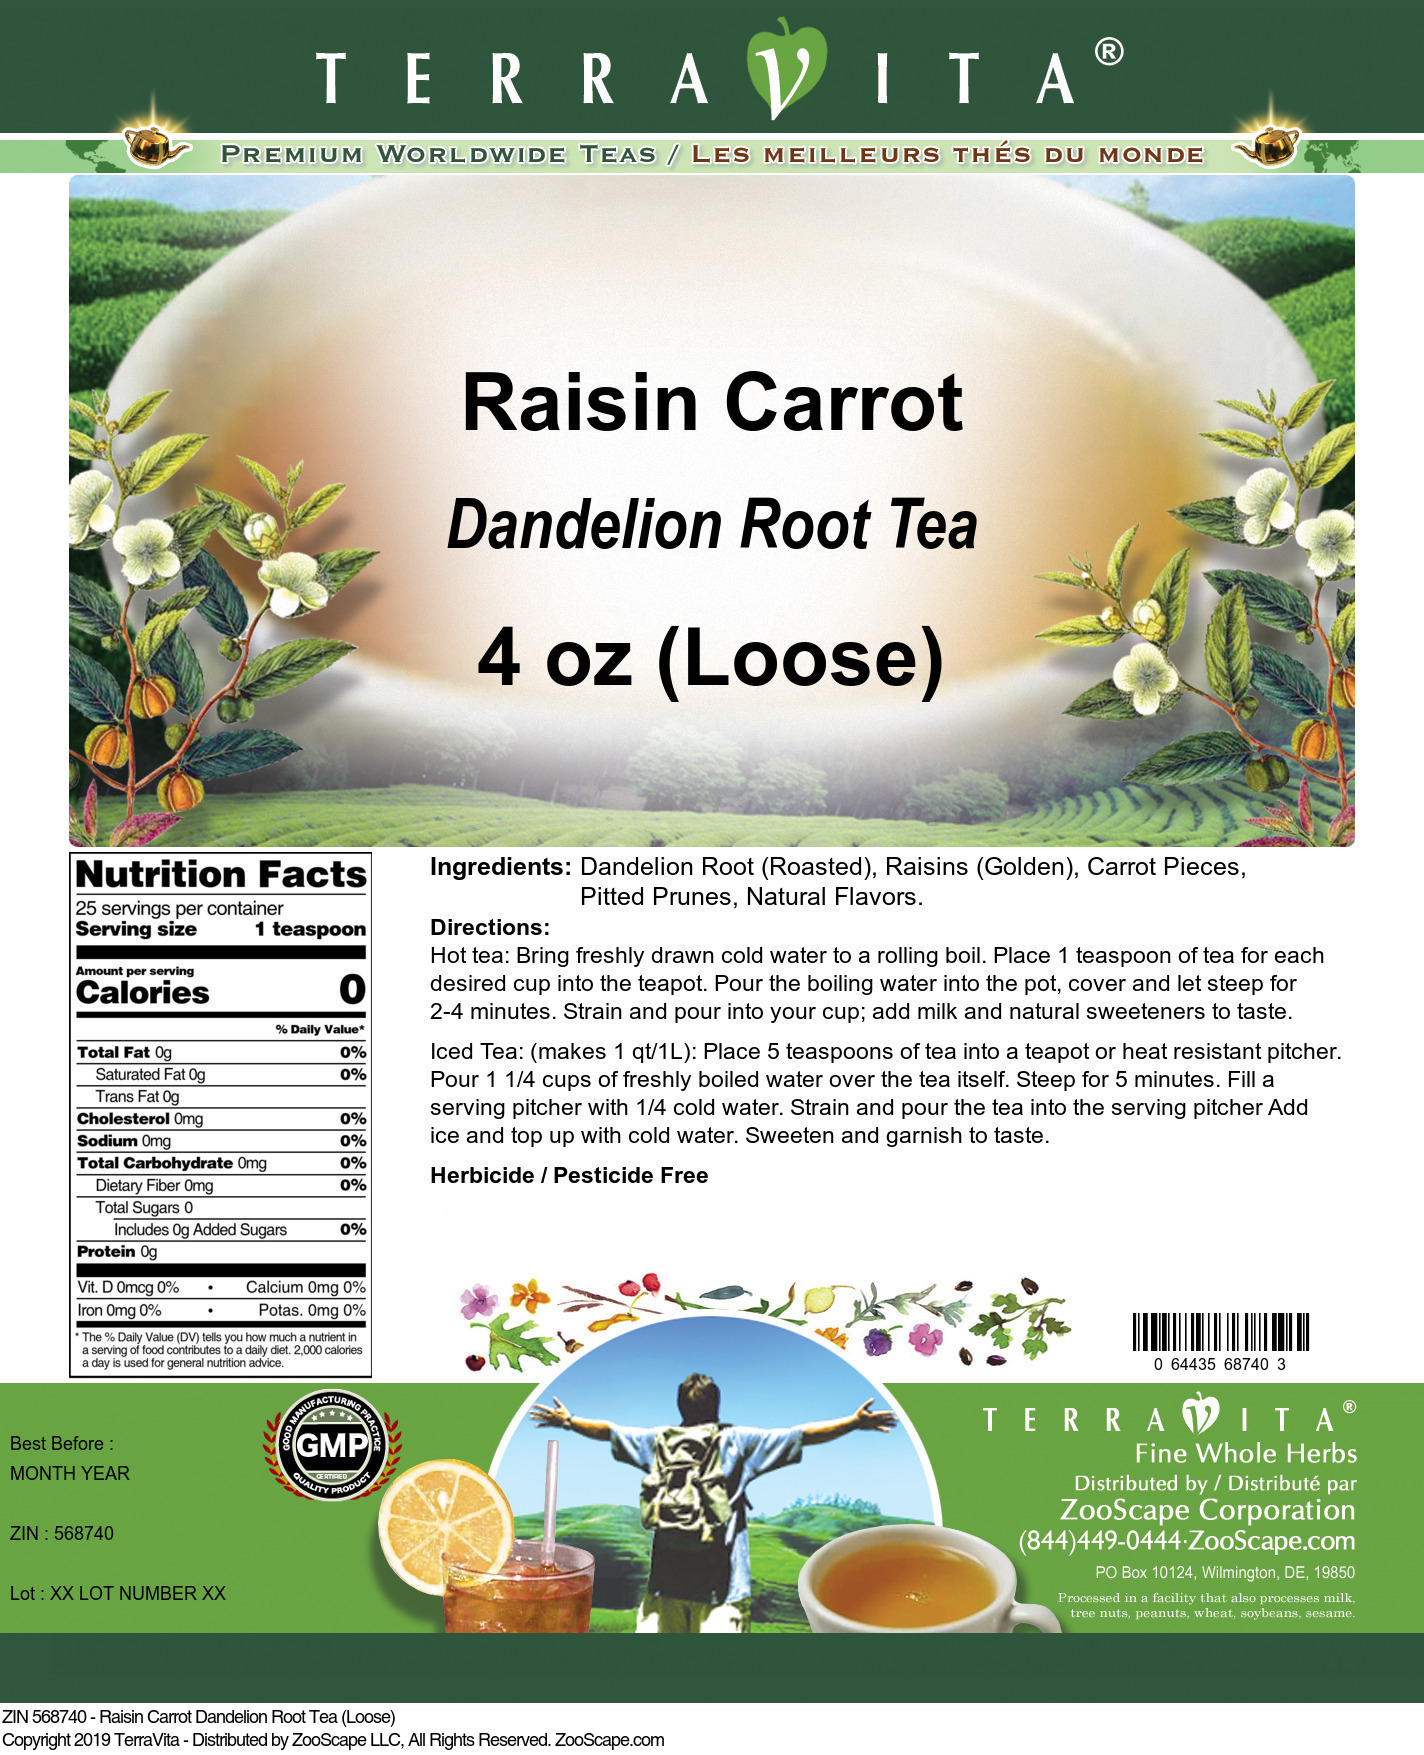 Raisin Carrot Dandelion Root